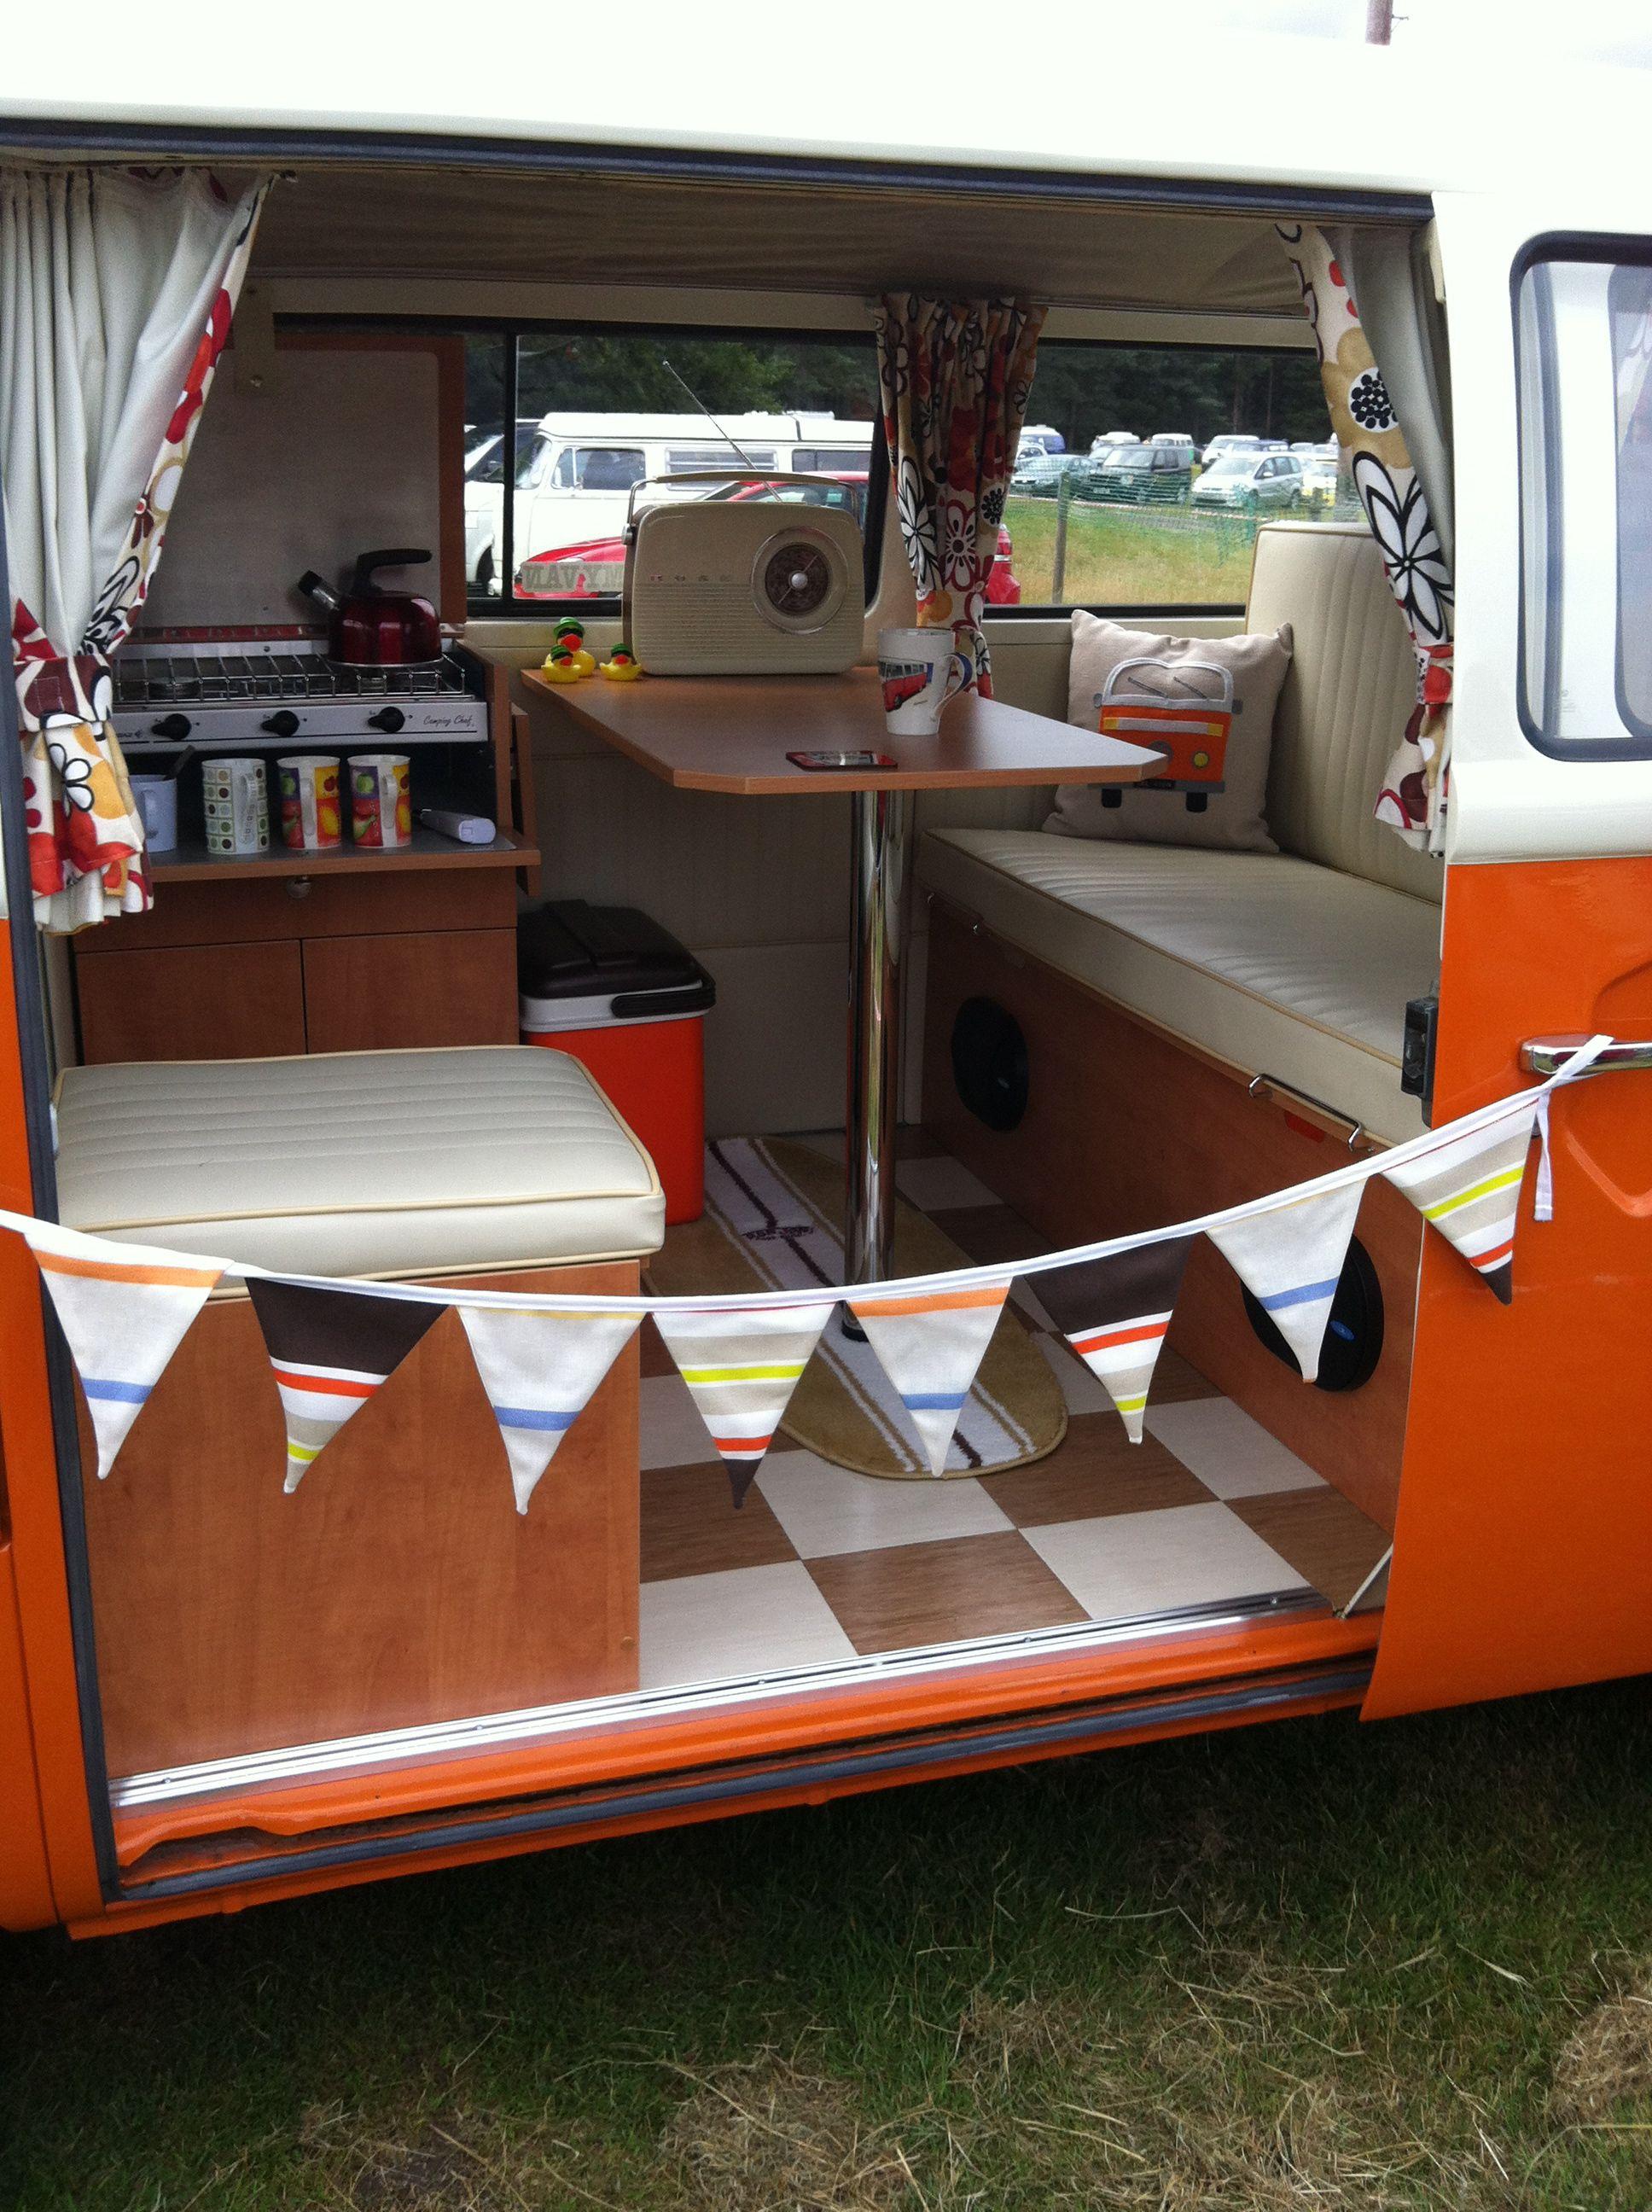 15 Dreamy Camper Van Interiors That Will Inspire Your